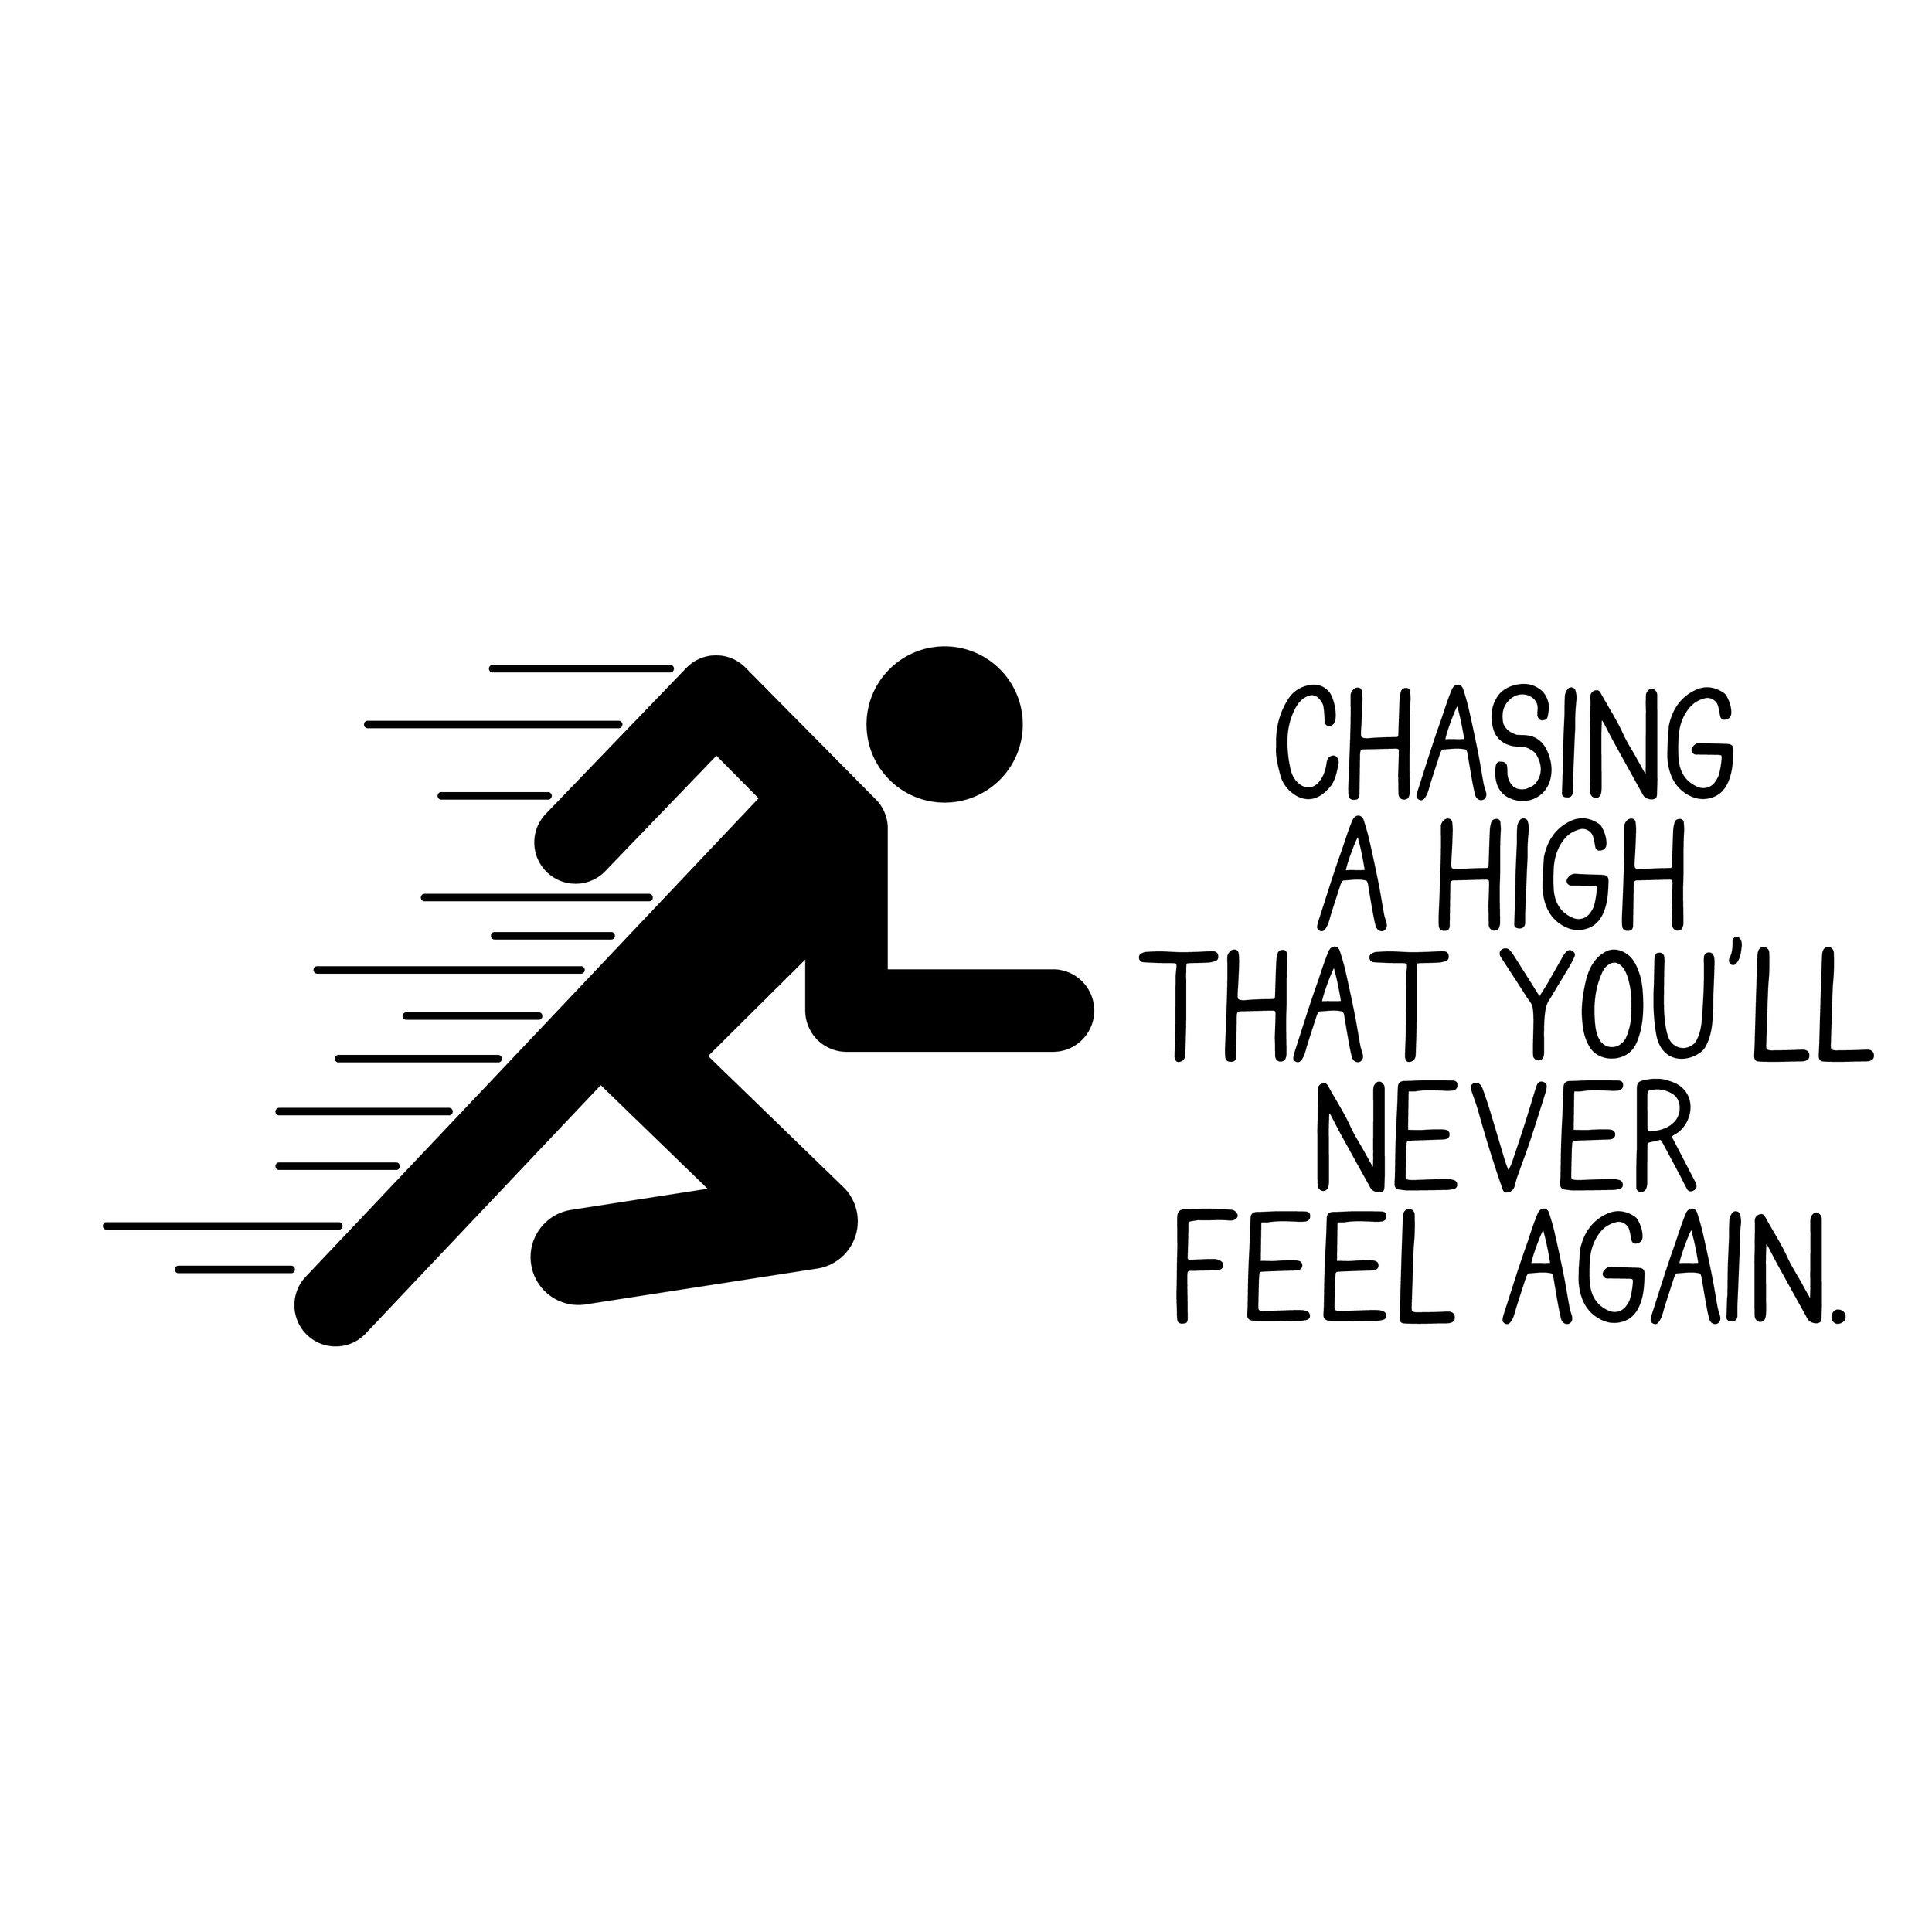 chasingahigh-01.jpg